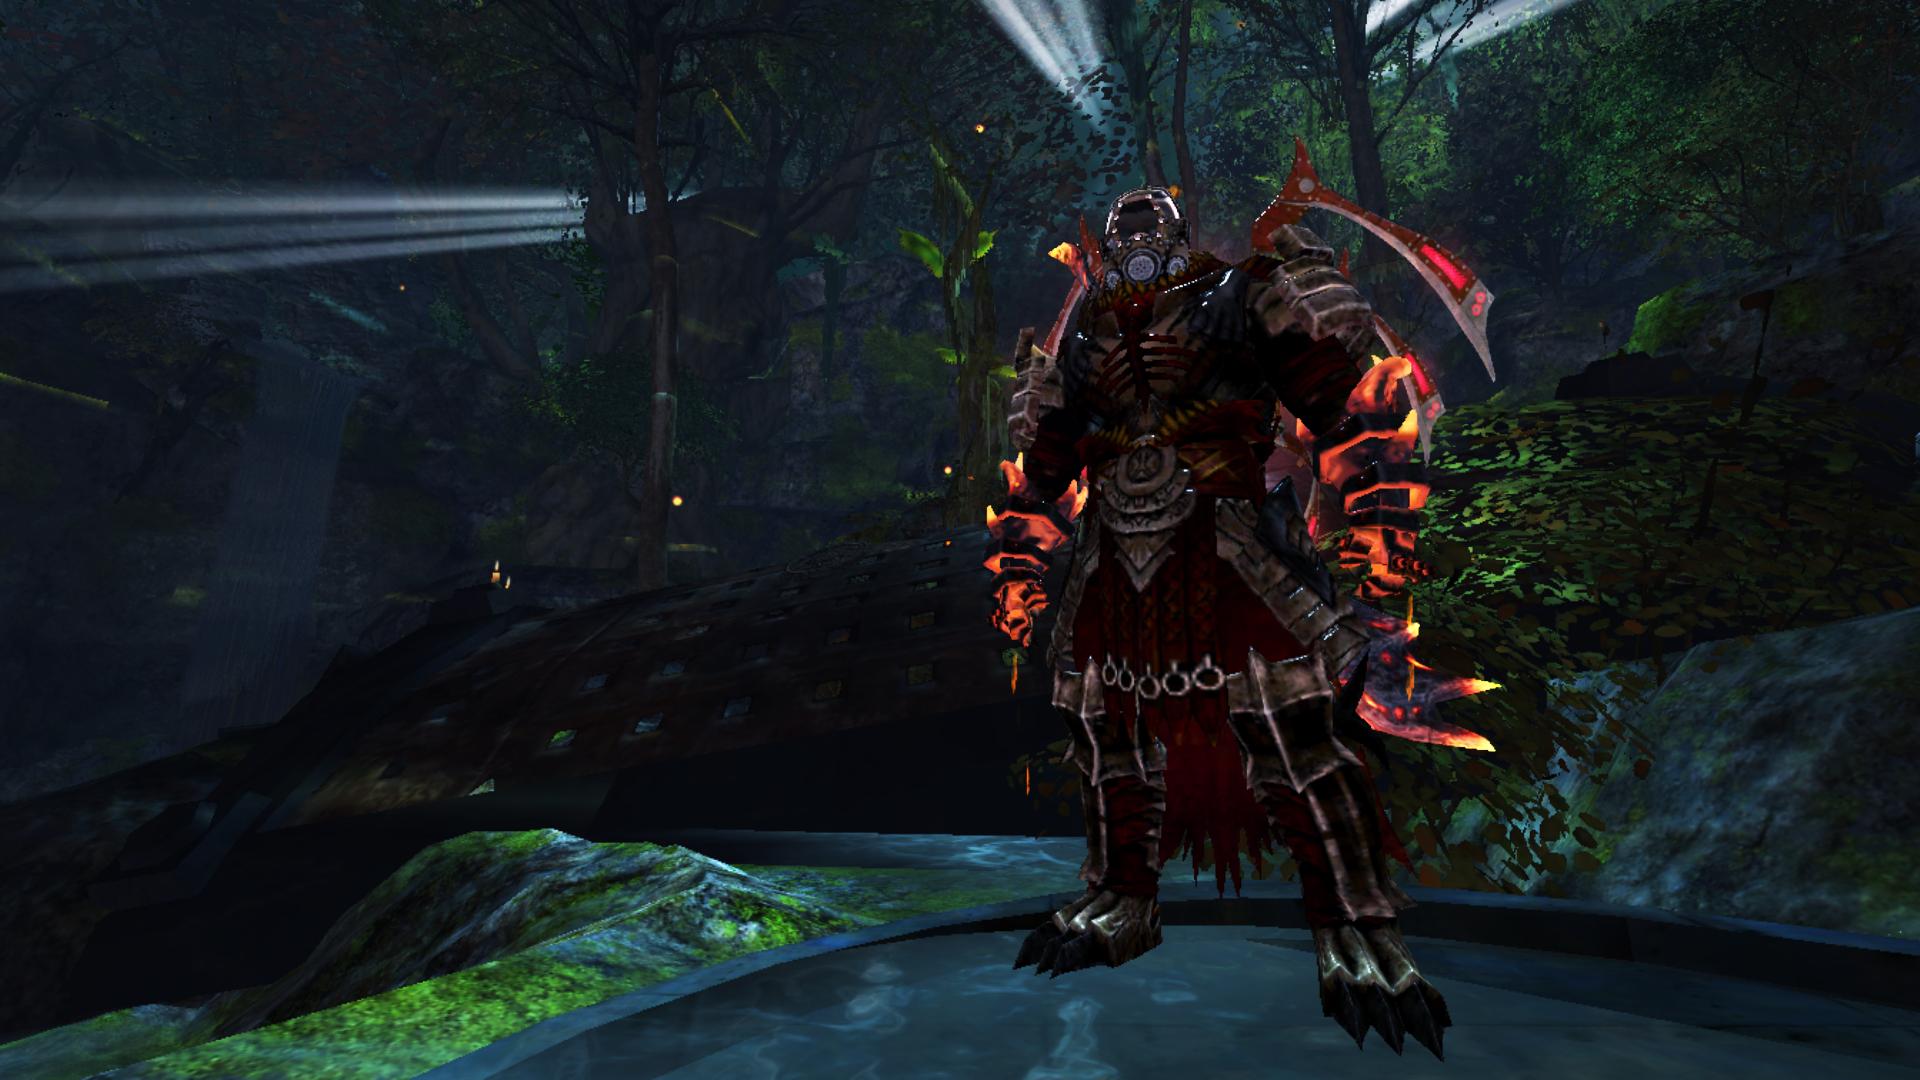 GW2 Character Scrnshts- Norn Warrior by StayUnnoticed on